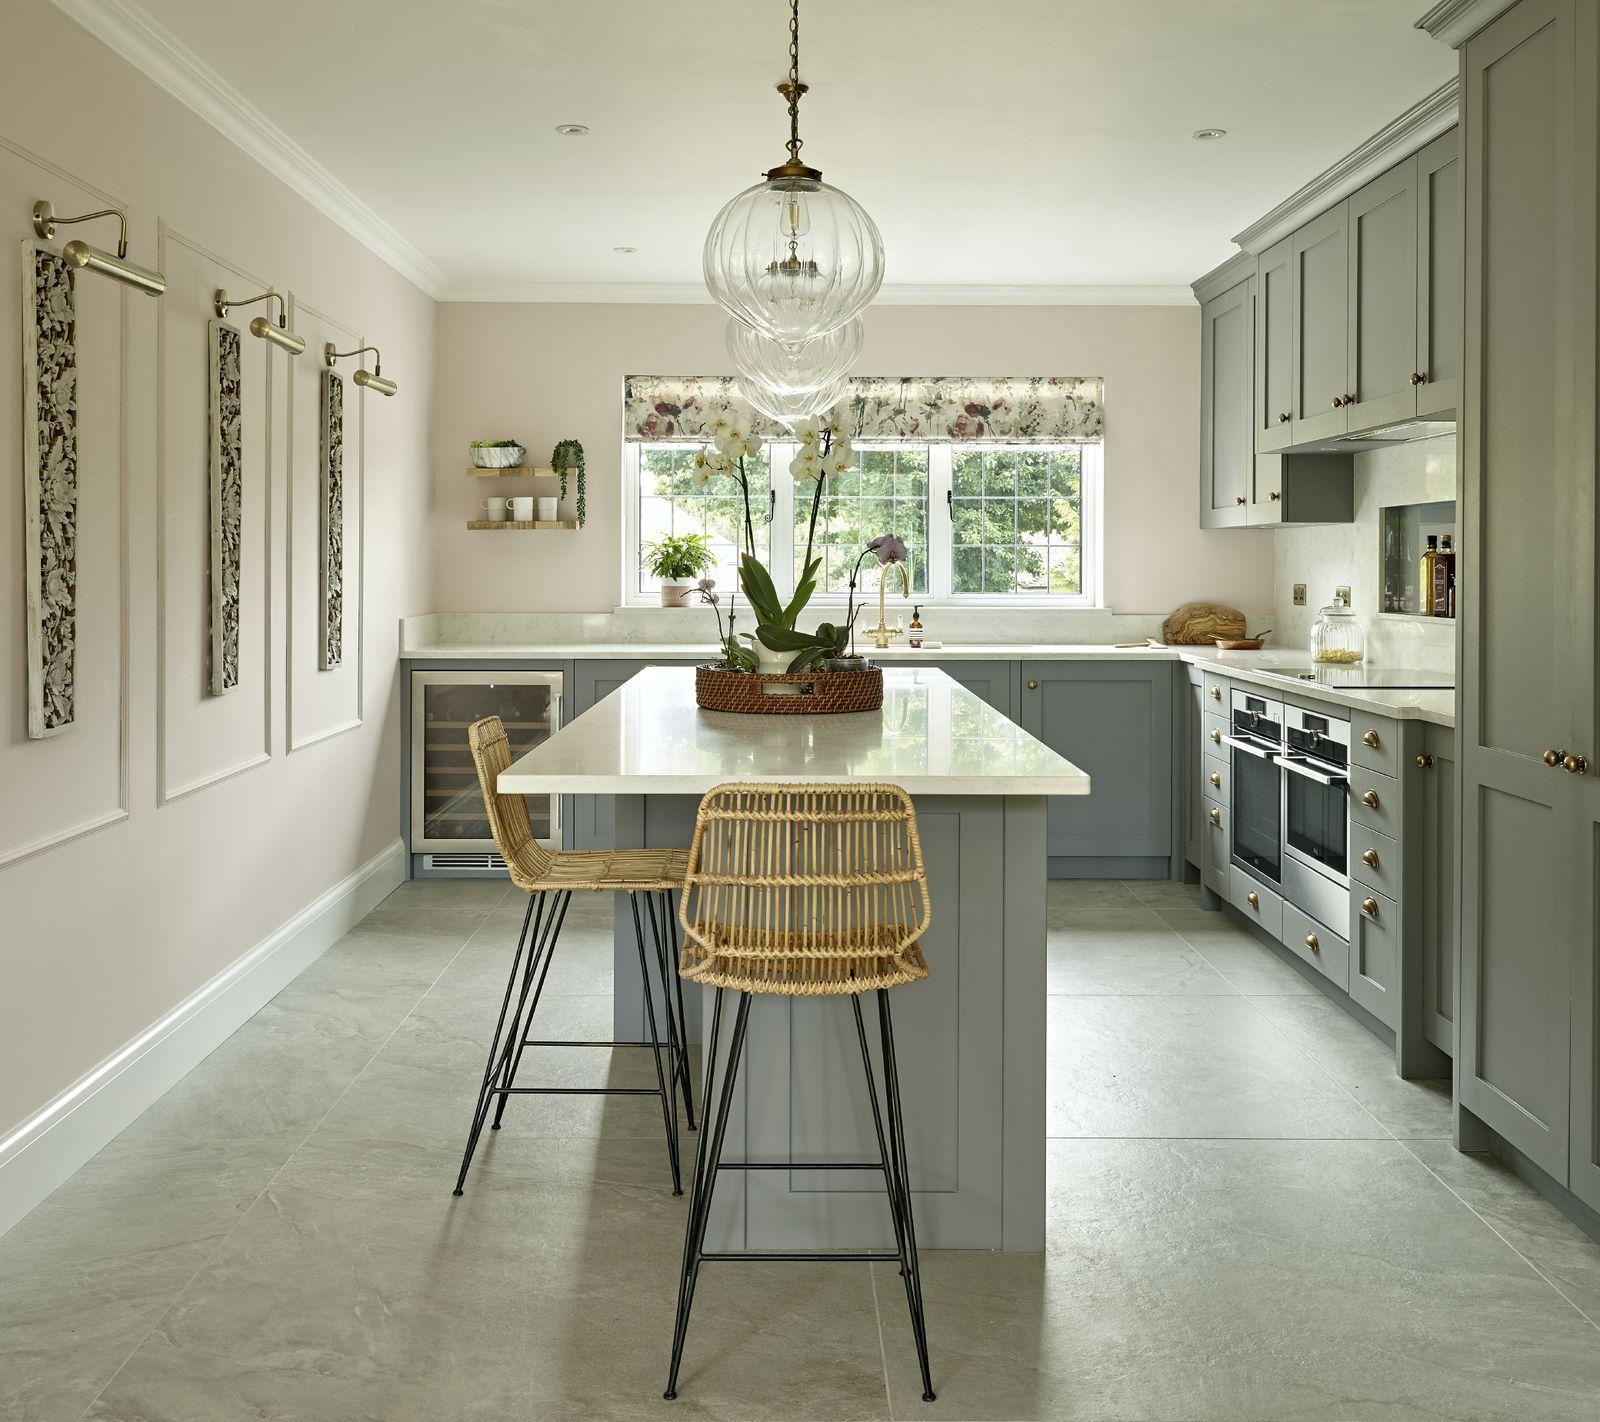 Kitchen Ideas 2019 Pictures